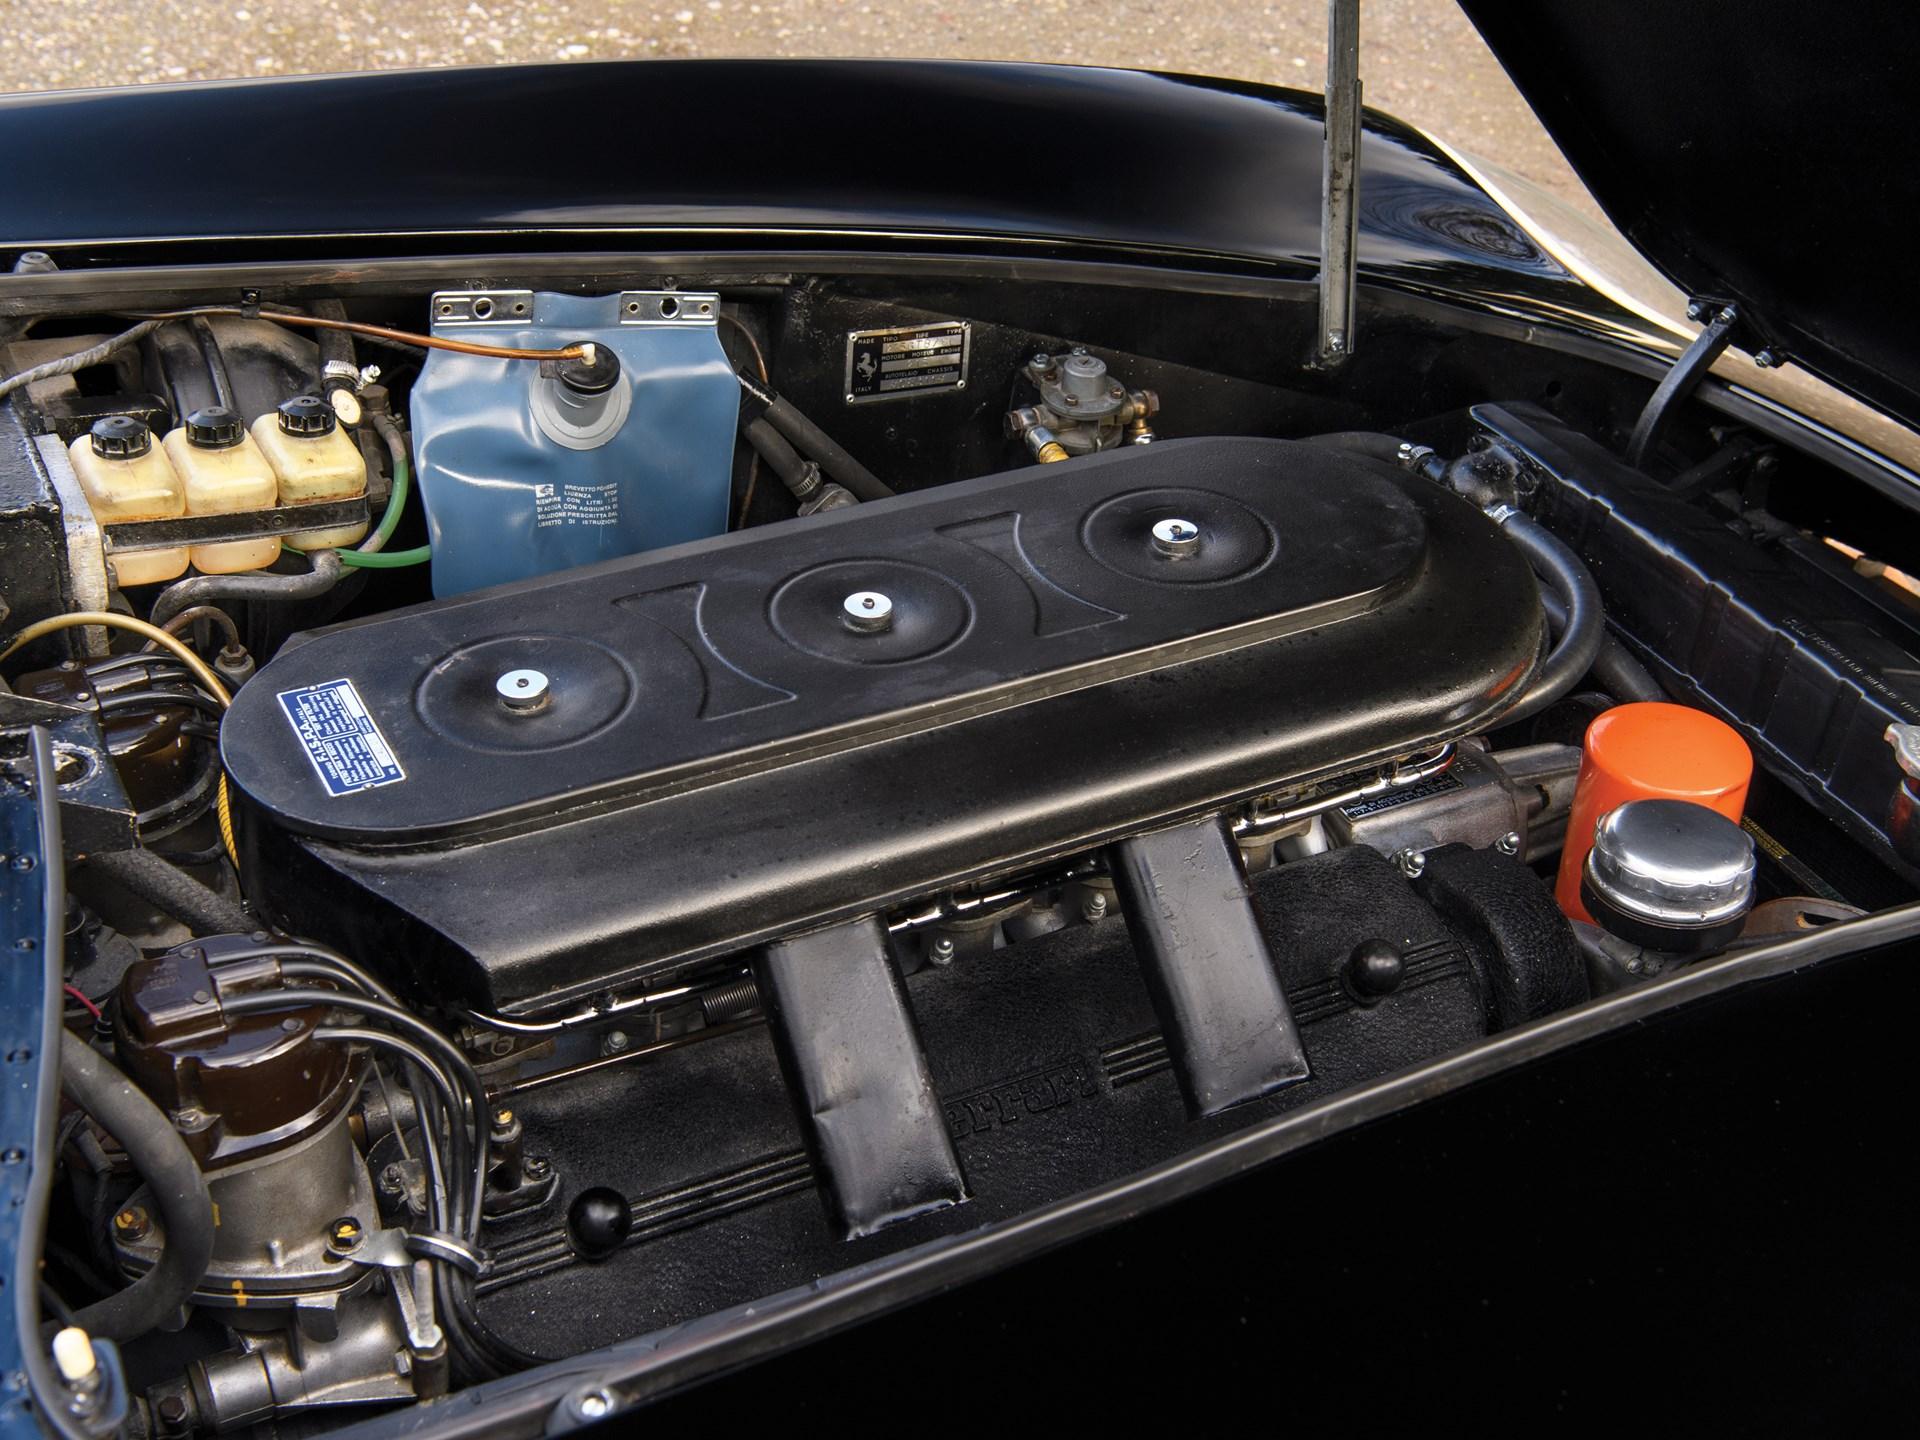 1966 Ferrari 275 GTB/6C Alloy Berlinetta by Scaglietti